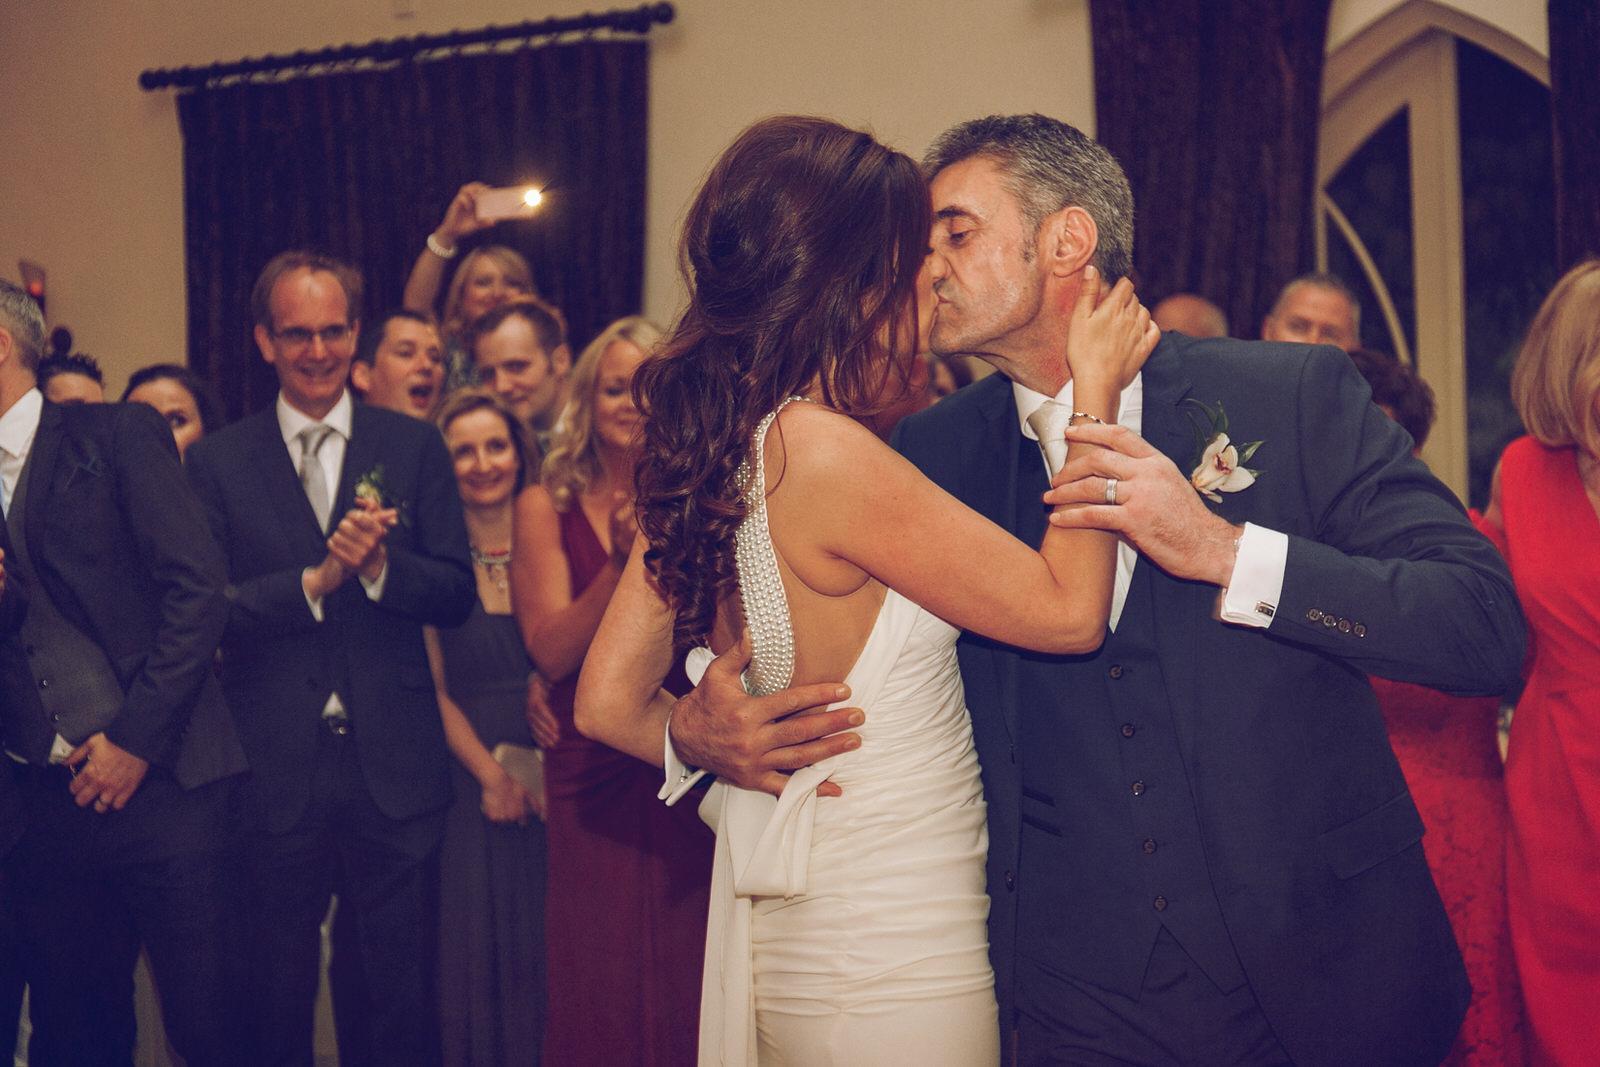 Brooklodge-wicklow-wedding-photographer_146.jpg